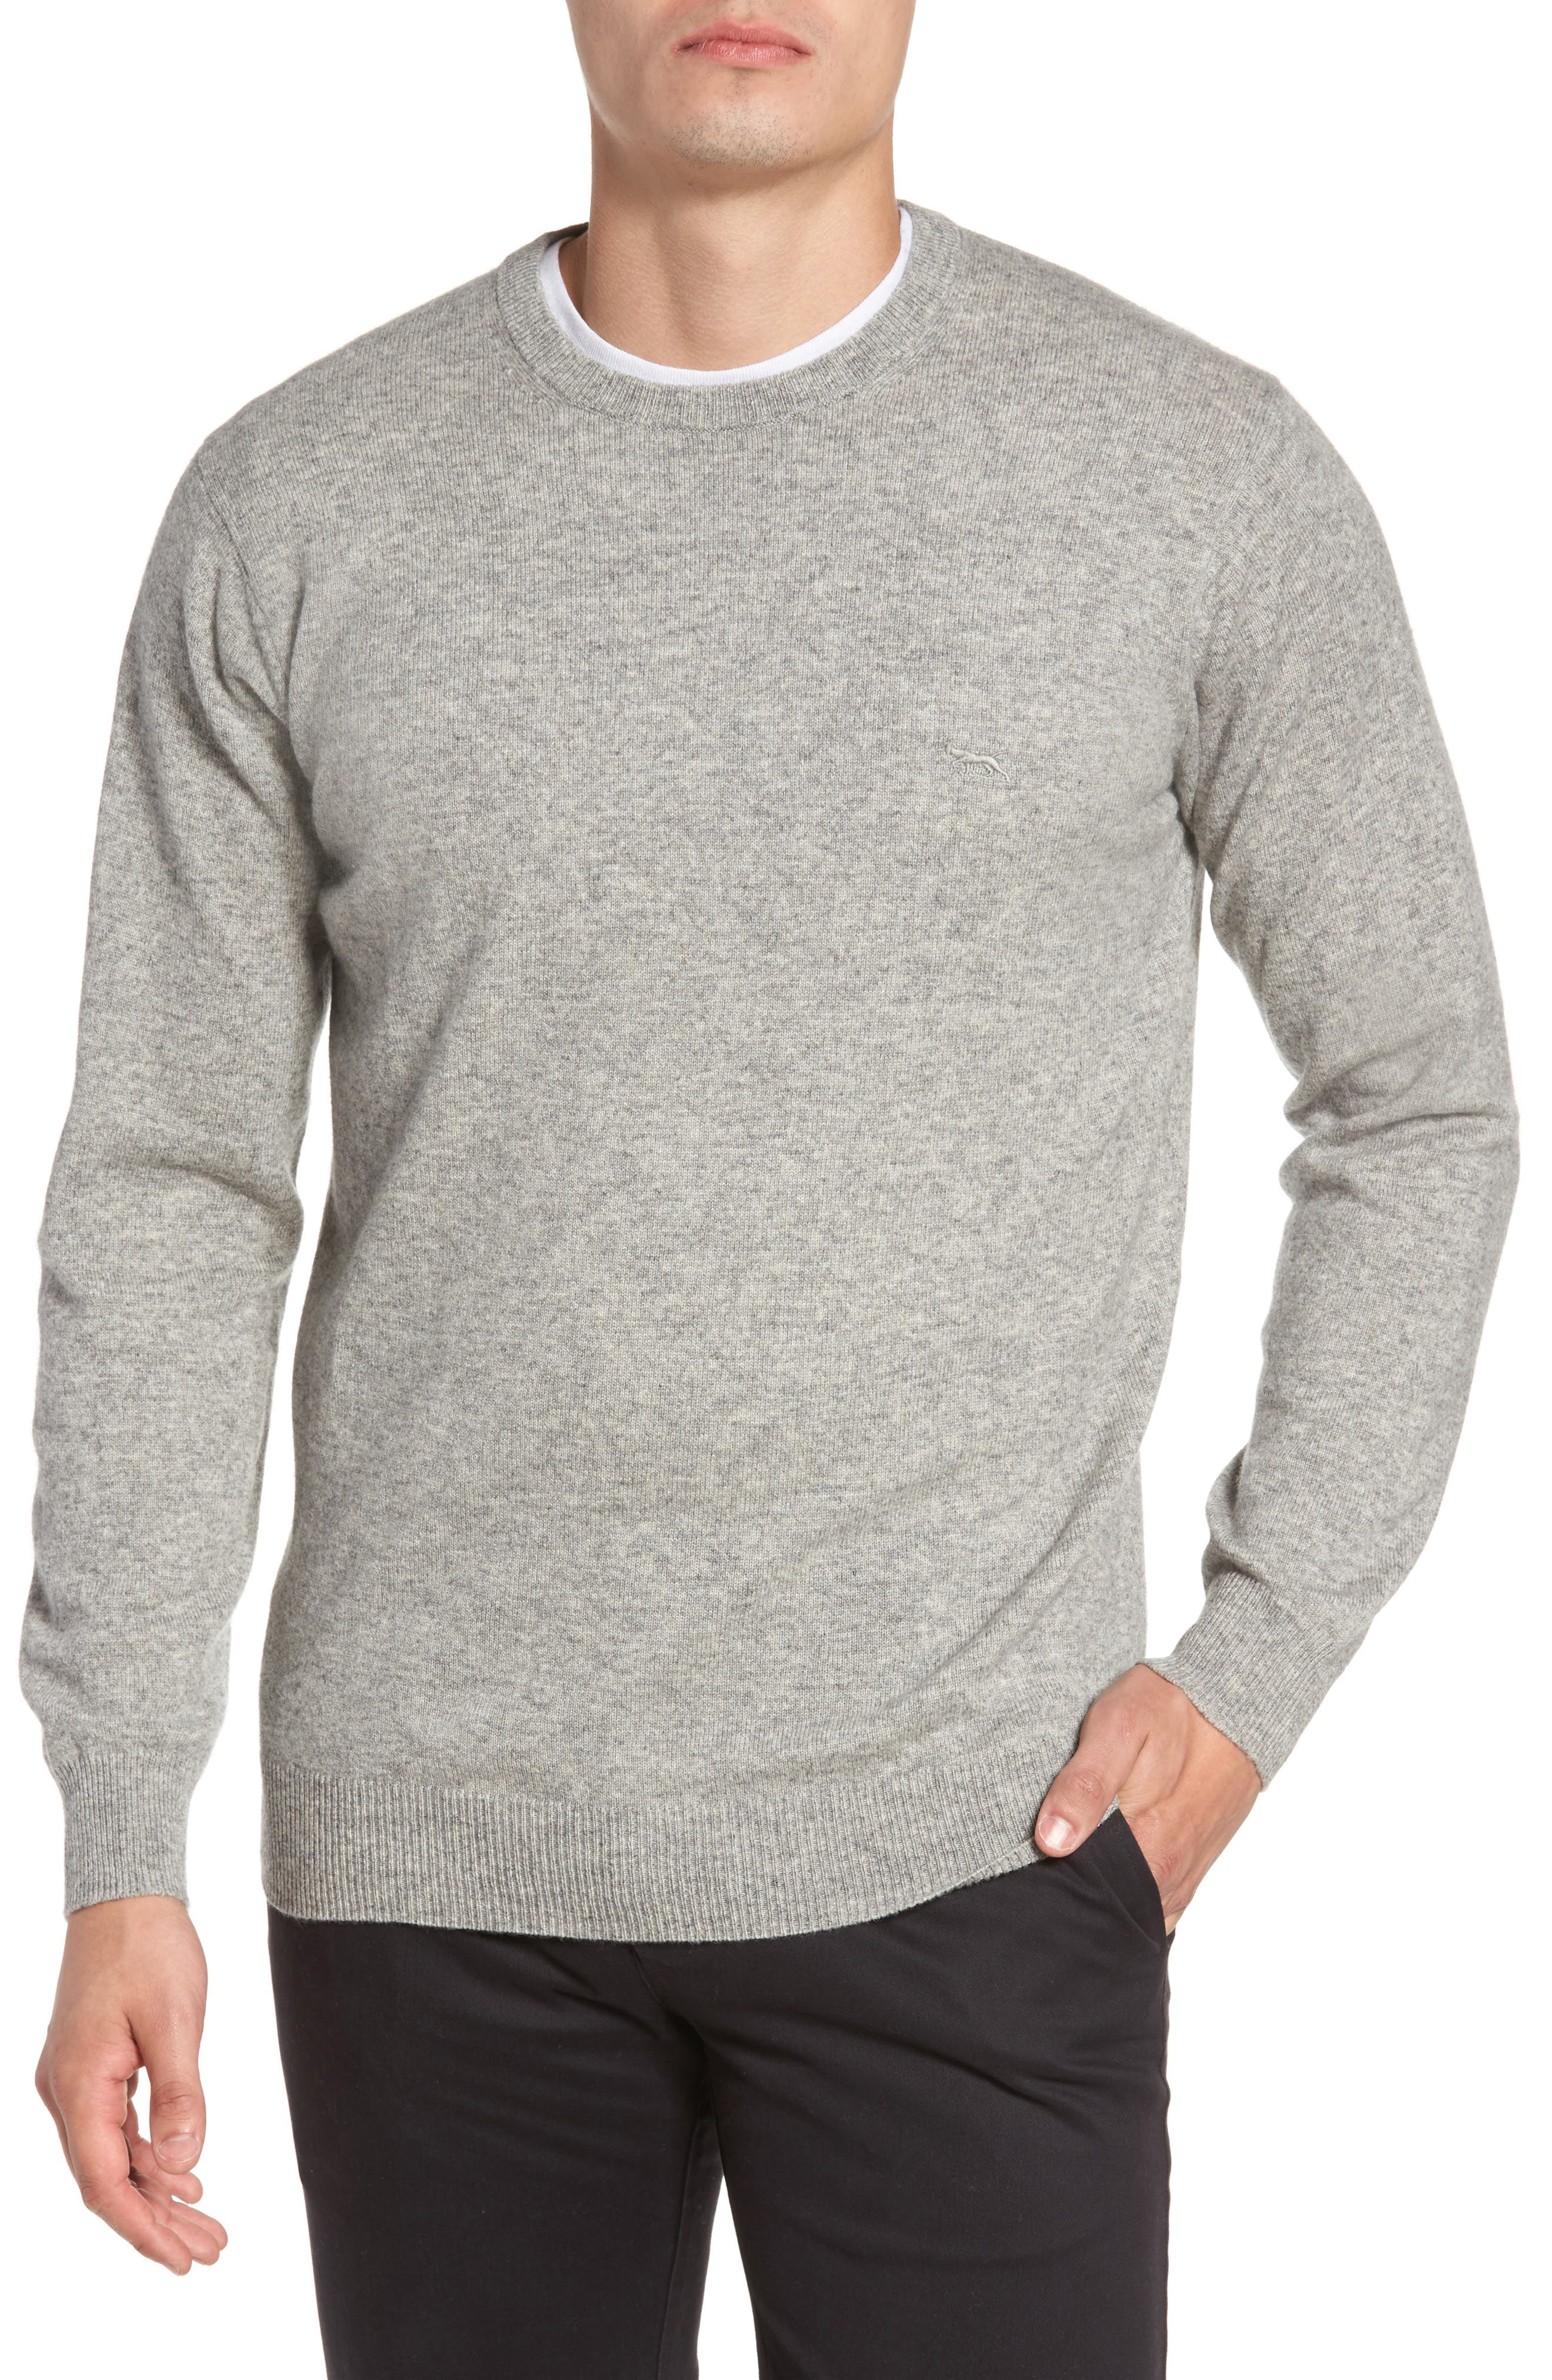 Rodd & Gunn Wellington Wool Sweater